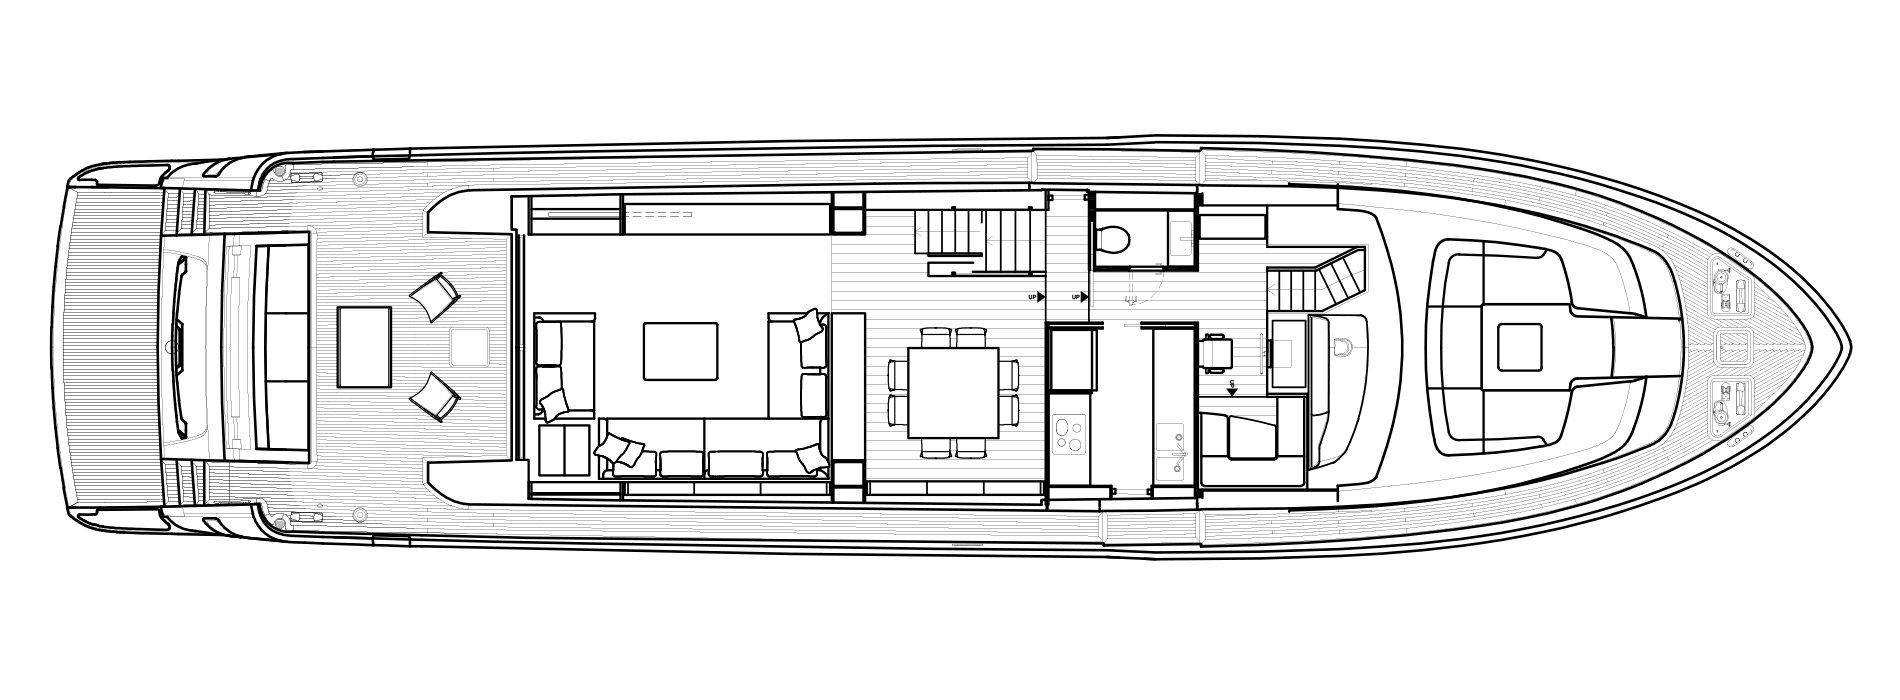 Sanlorenzo Yachts SL86 Main Deck Version A